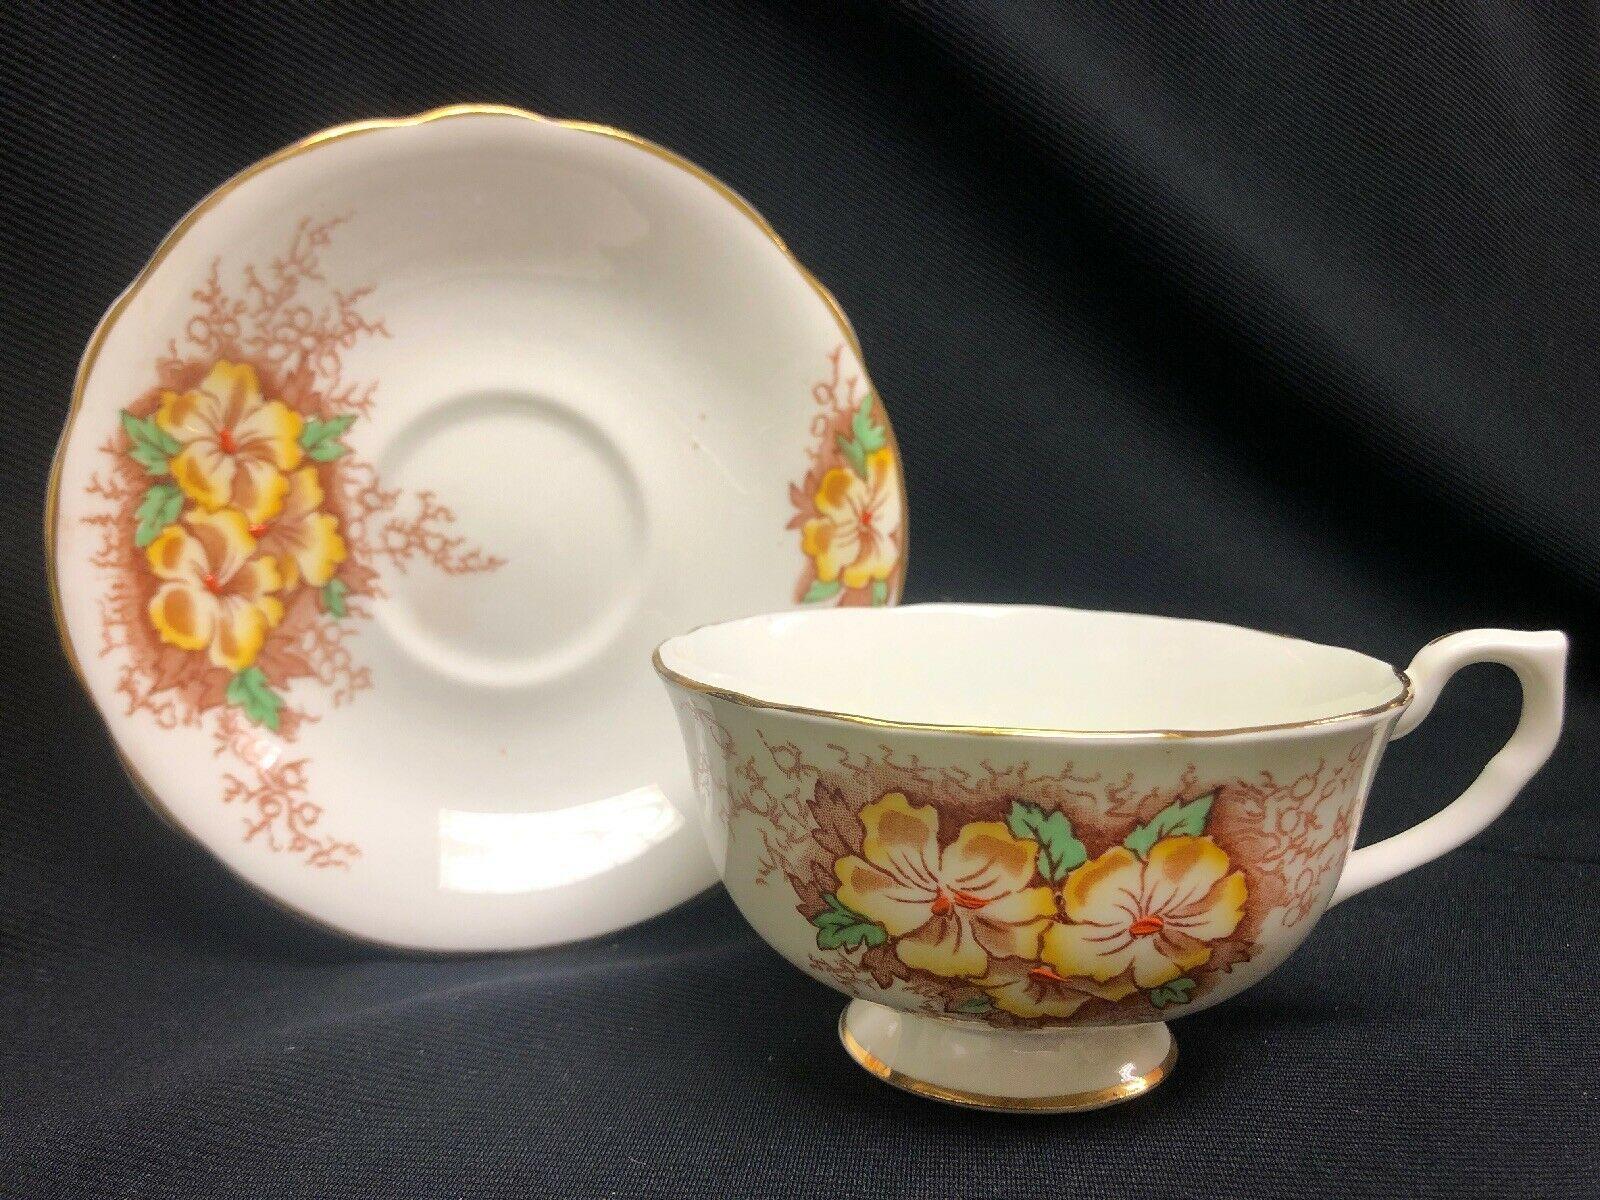 Clarence Bone China England Tea Cup & Saucer Yellow Flowers    $12.99